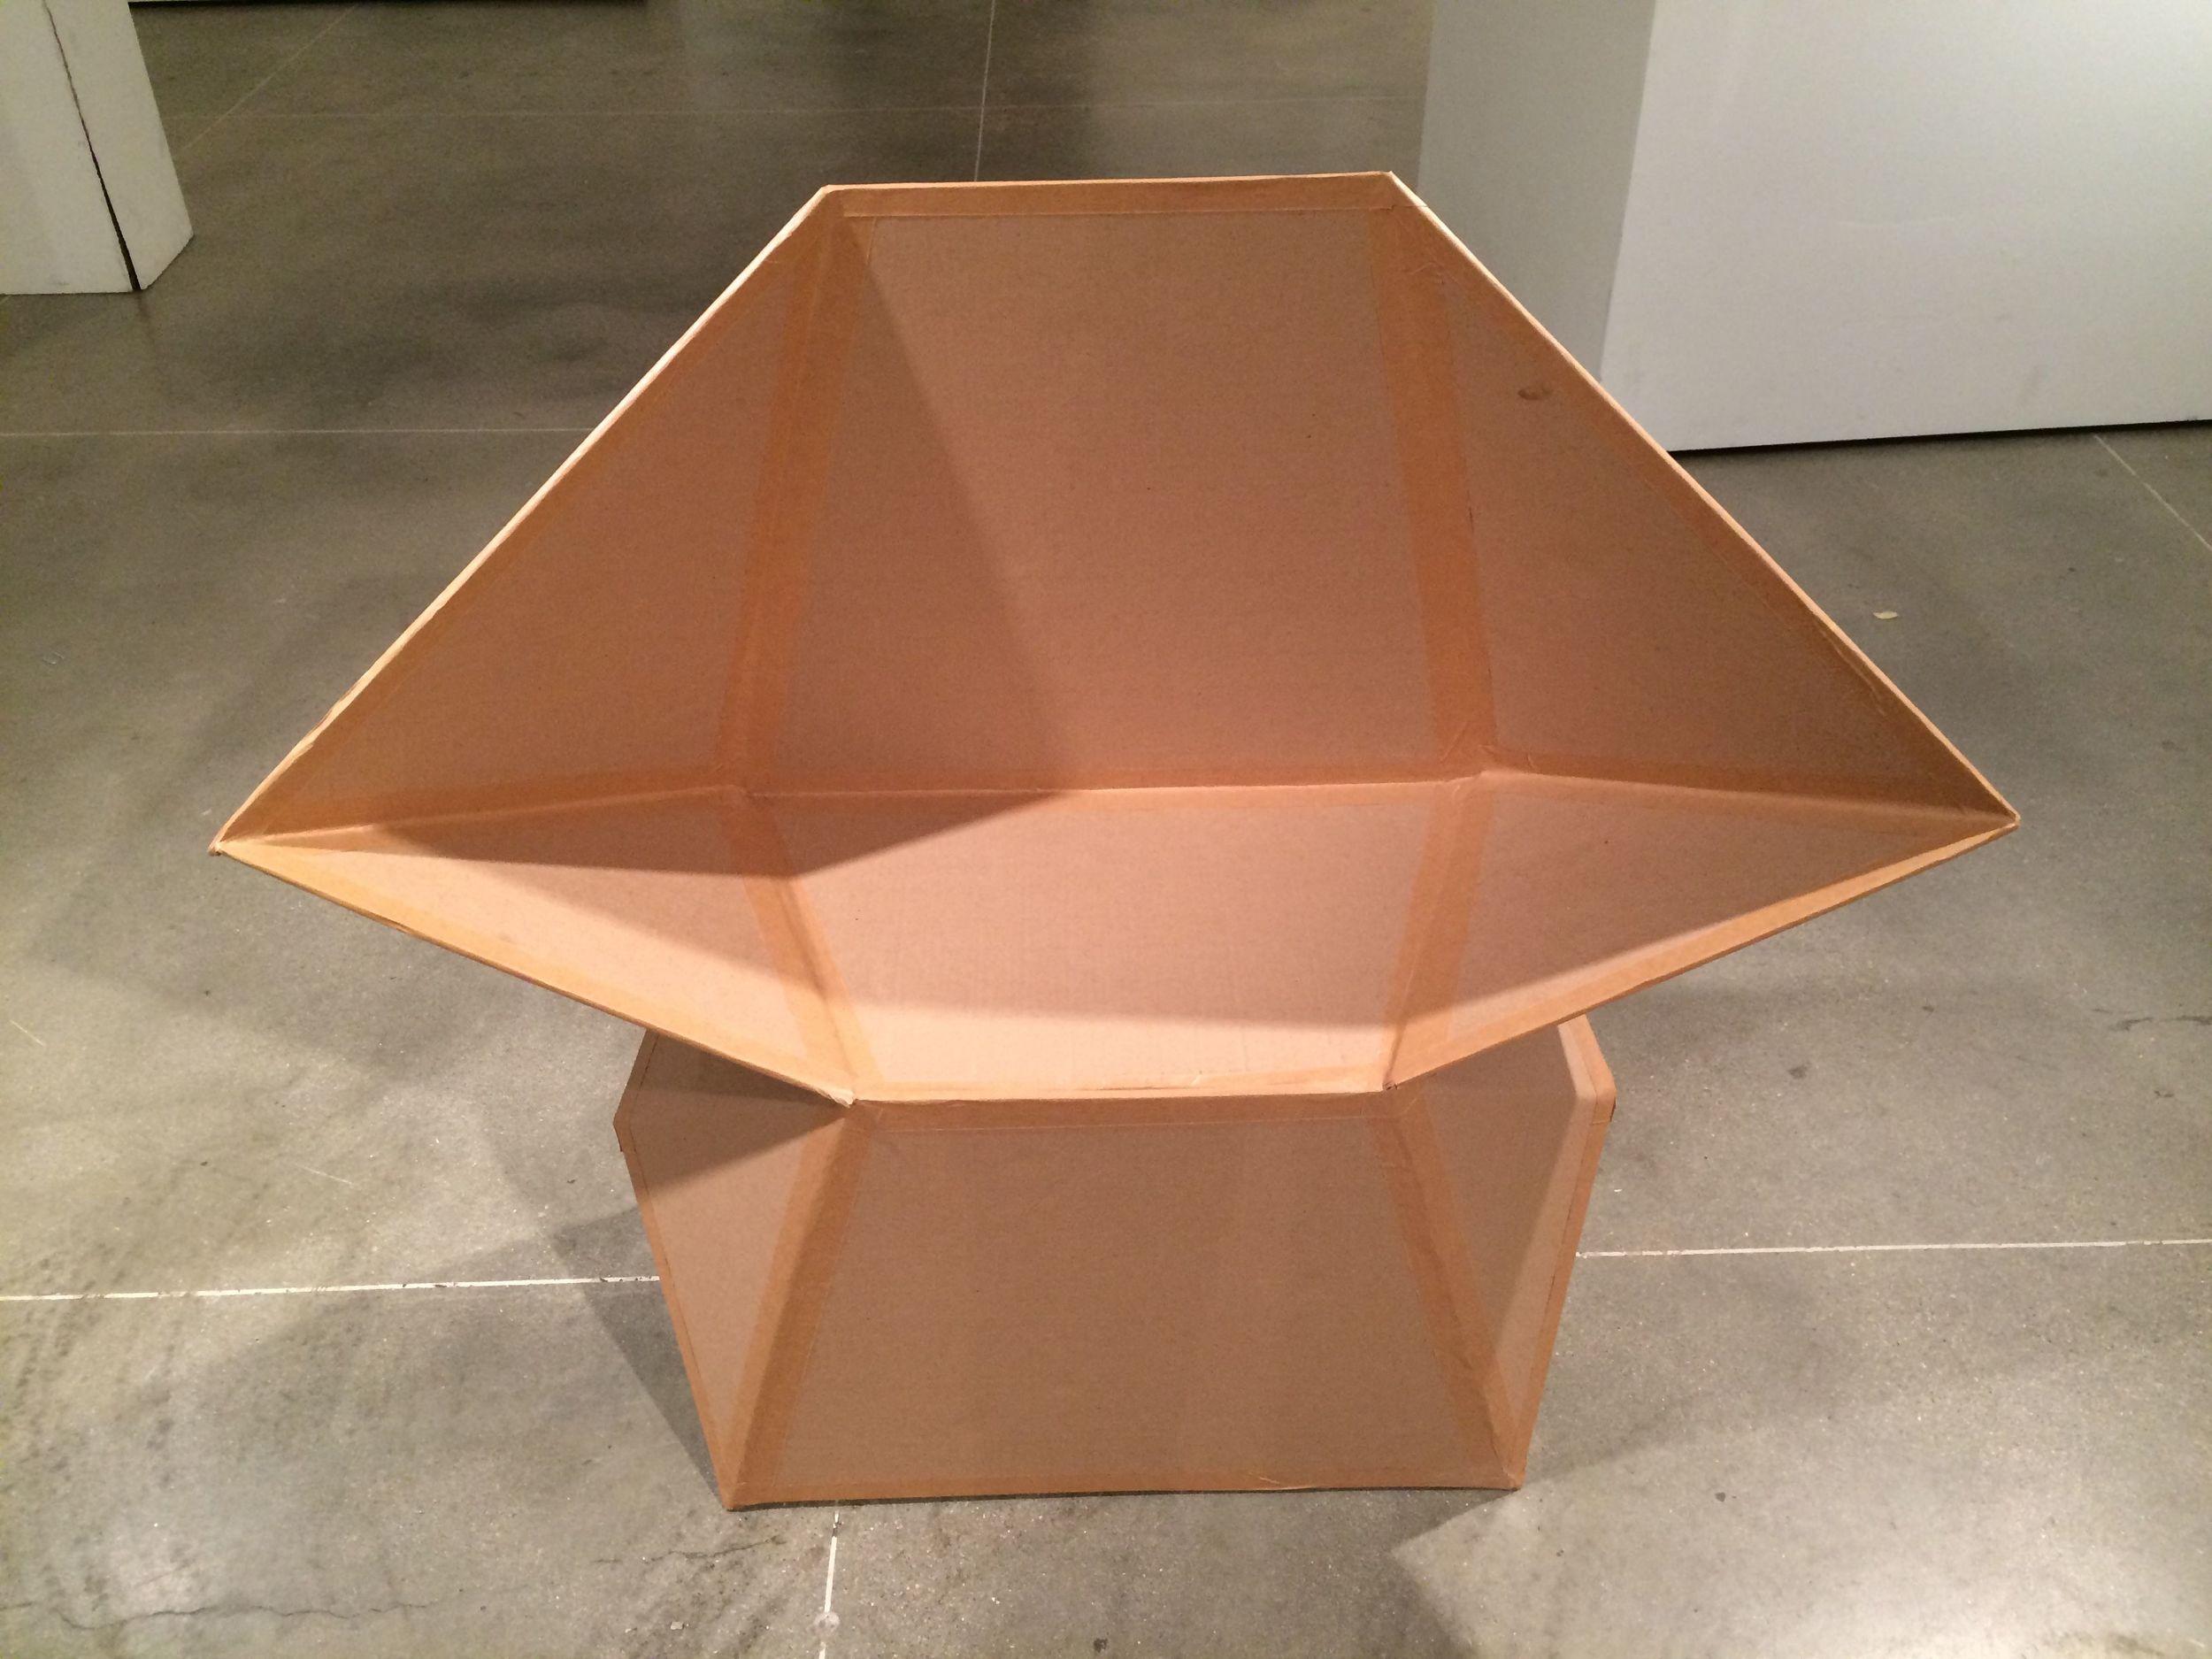 Cardboard Chair Assignment